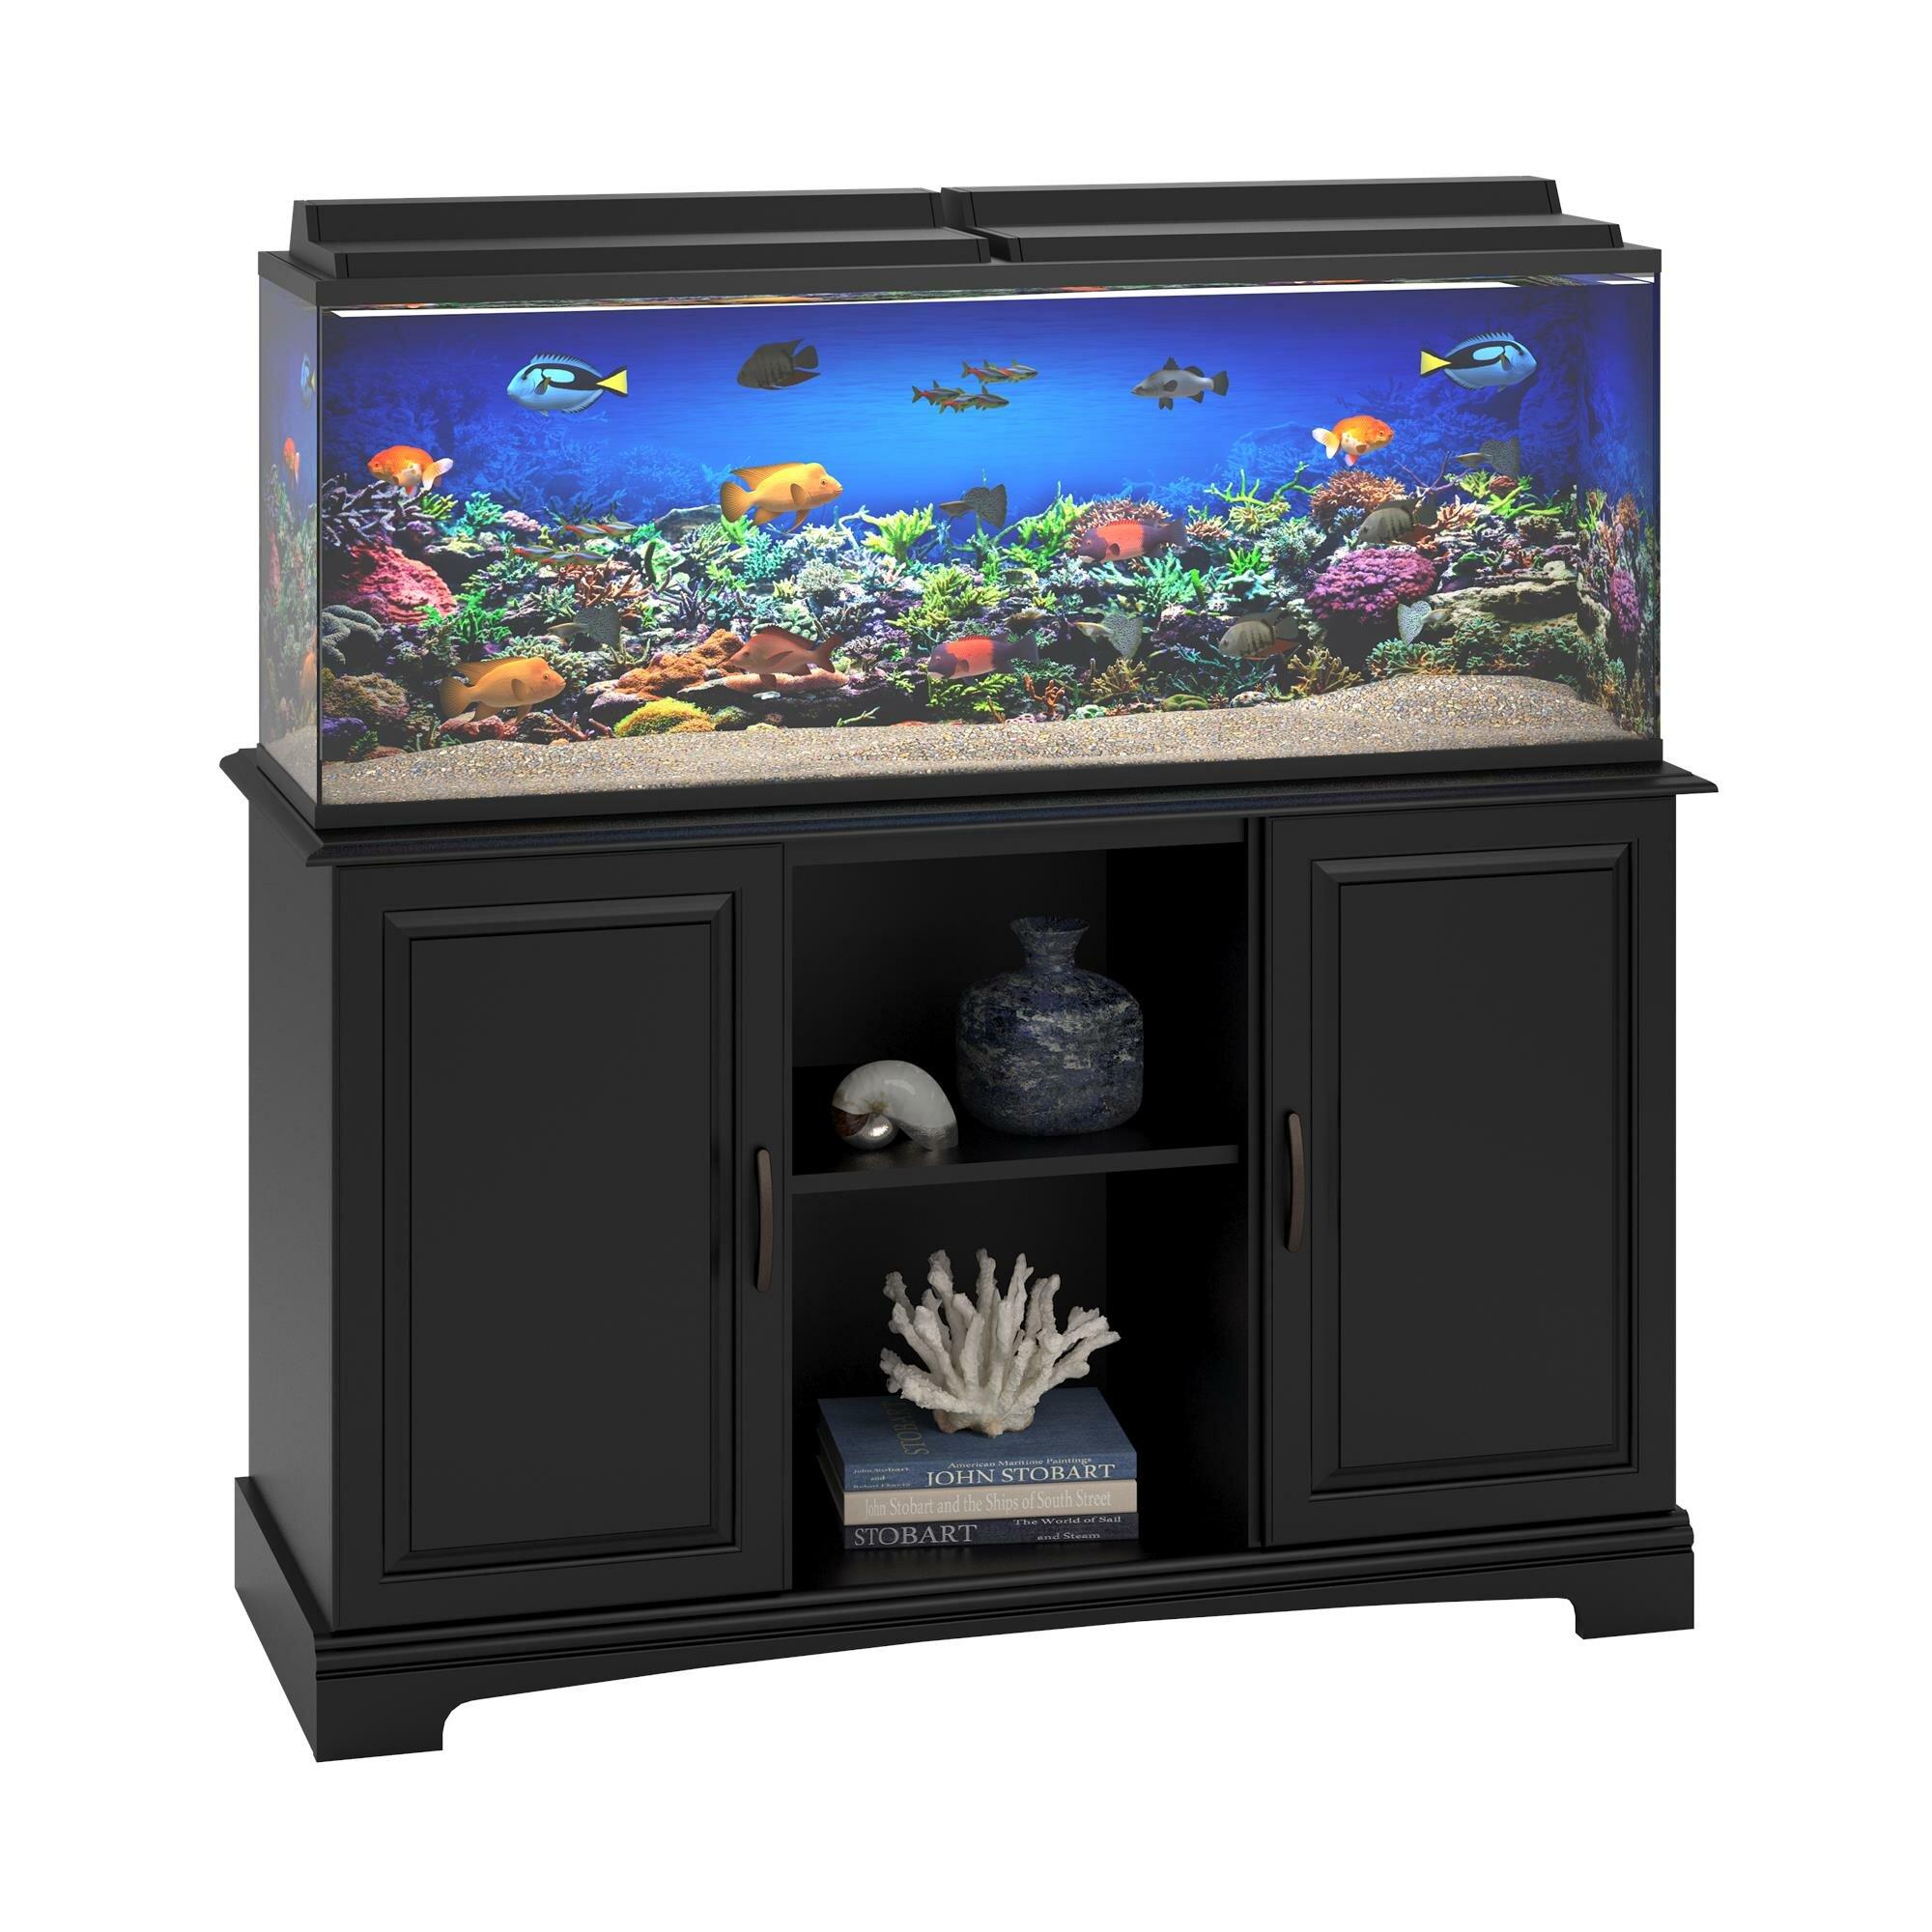 aquarium supplies 75 gallon - Pet Supplies : Pet Care ...